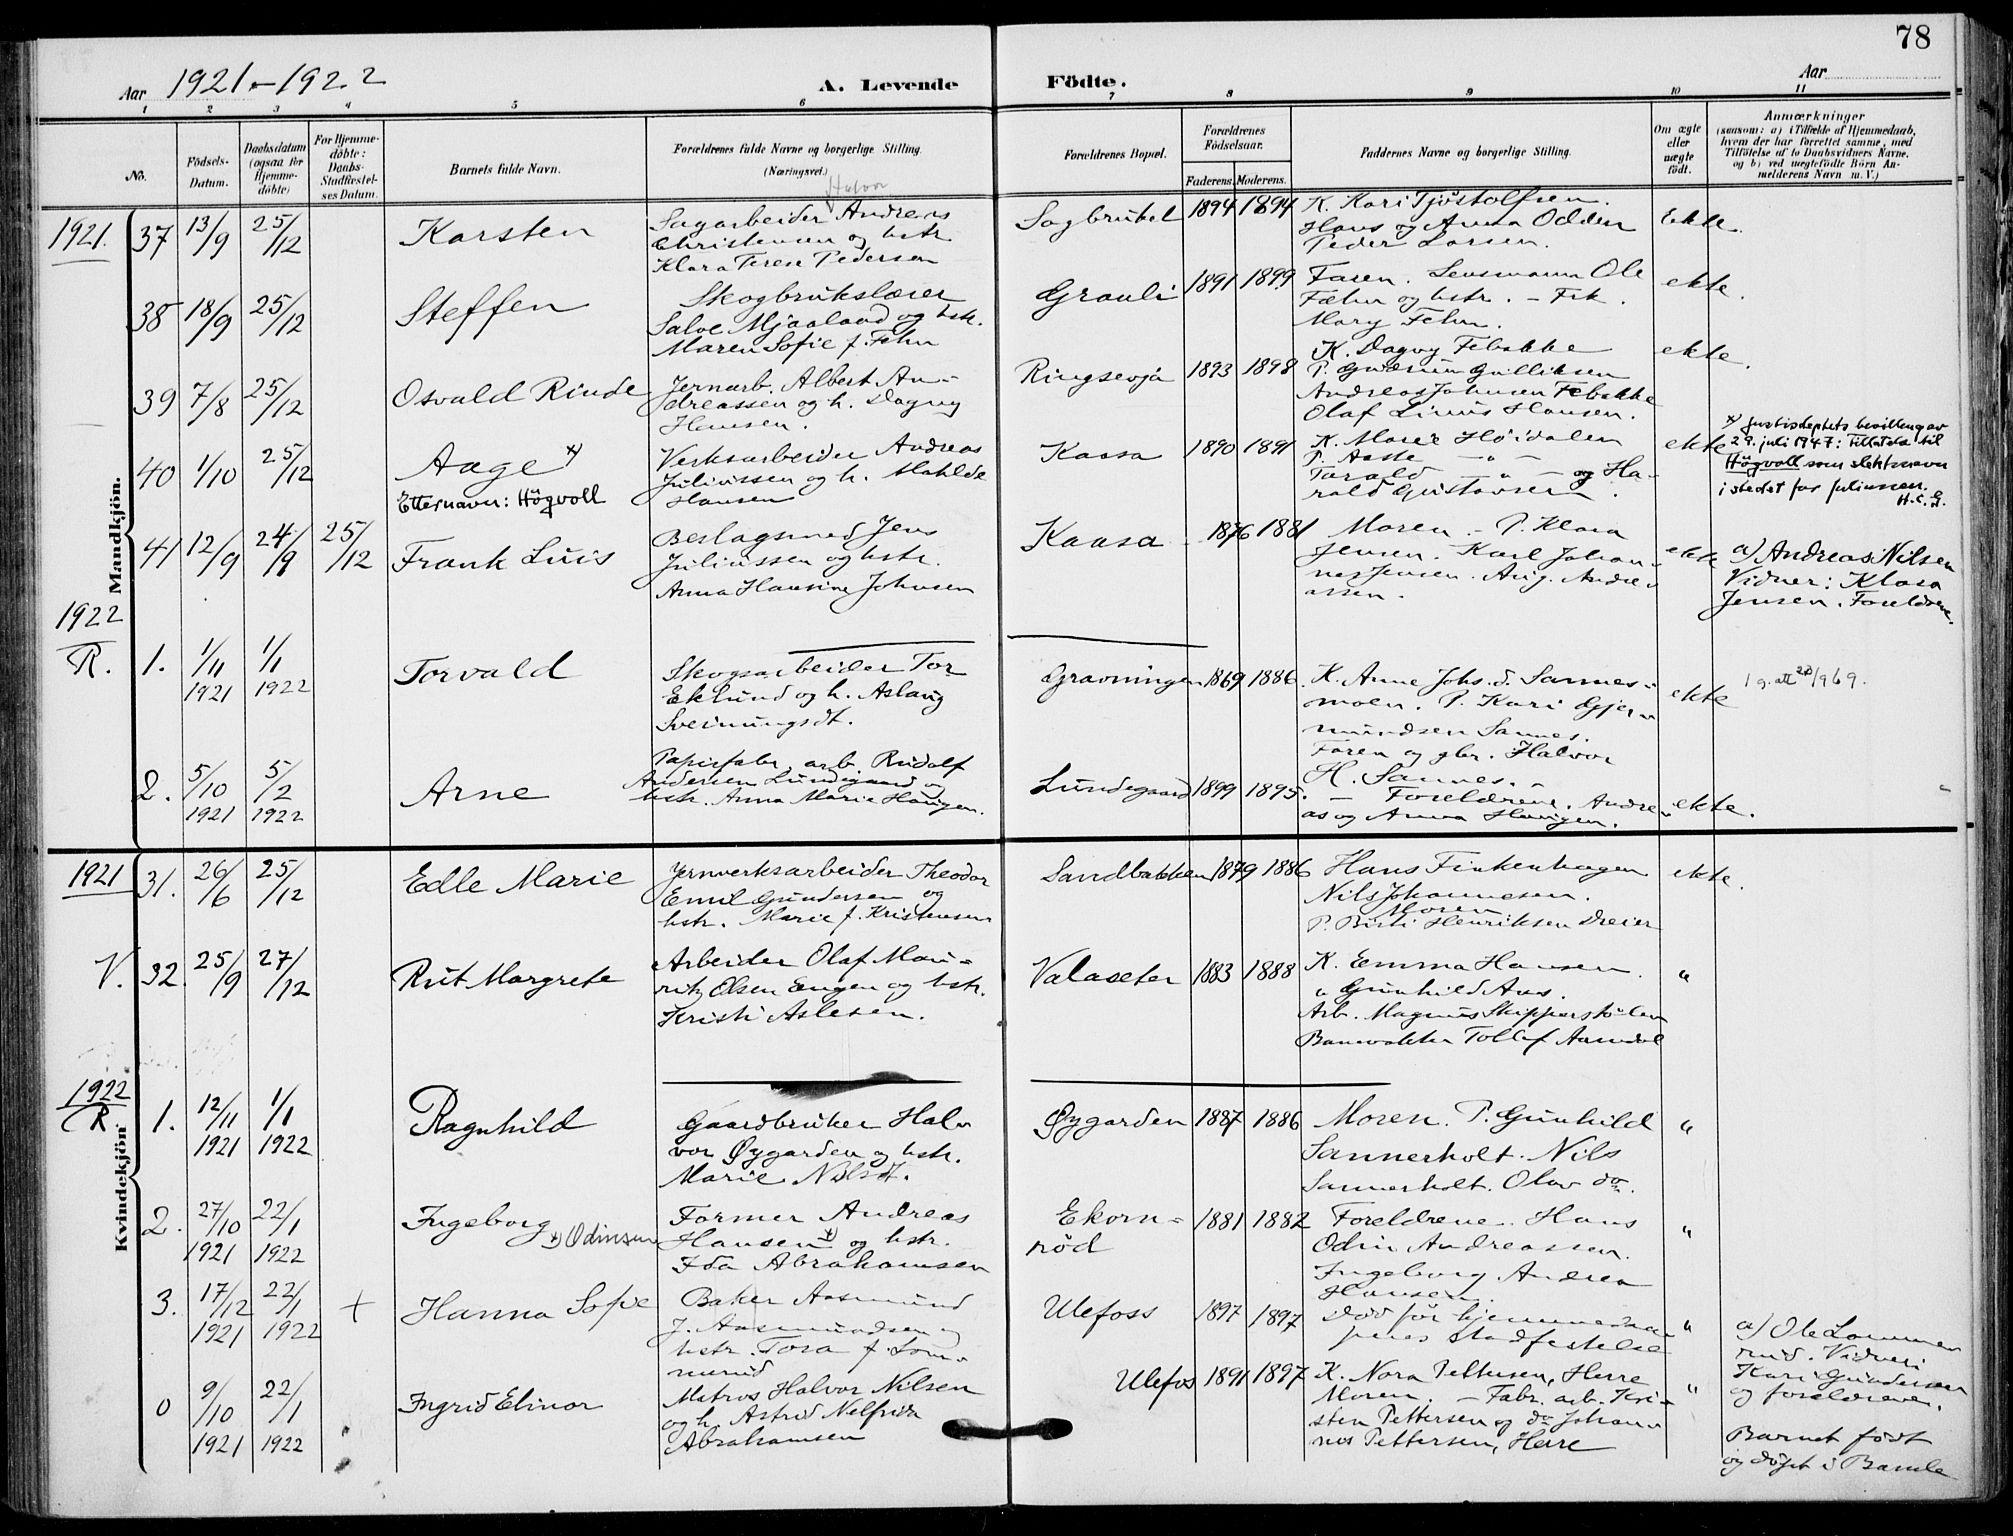 SAKO, Holla kirkebøker, F/Fa/L0012: Ministerialbok nr. 12, 1907-1923, s. 78